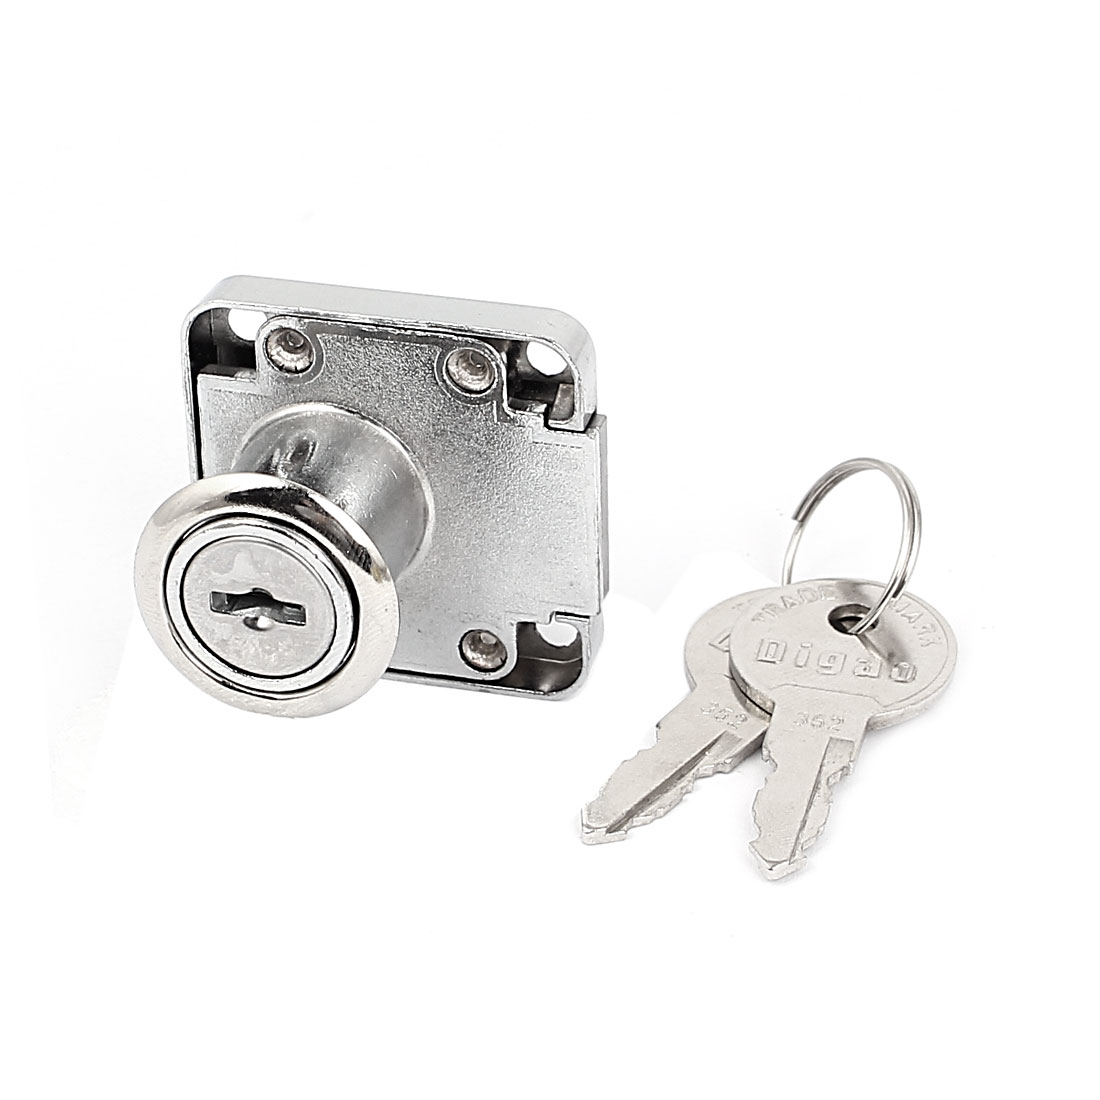 28mm High Cabinet Toolbox Cupboard Security Zinc Alloy Door Lock w 2 Keys